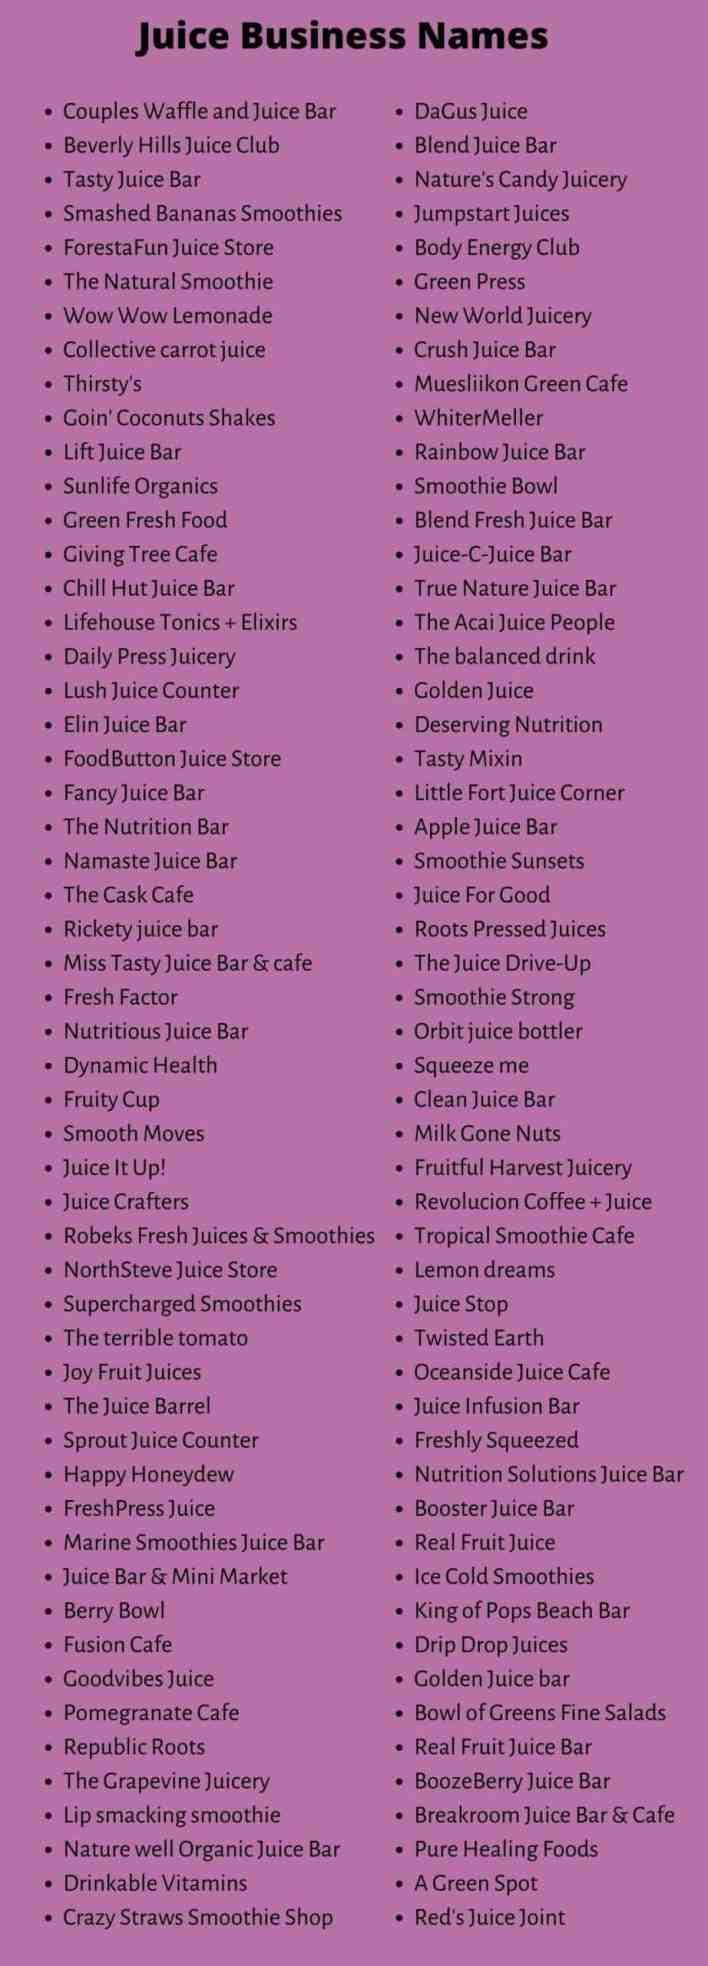 Juice business names